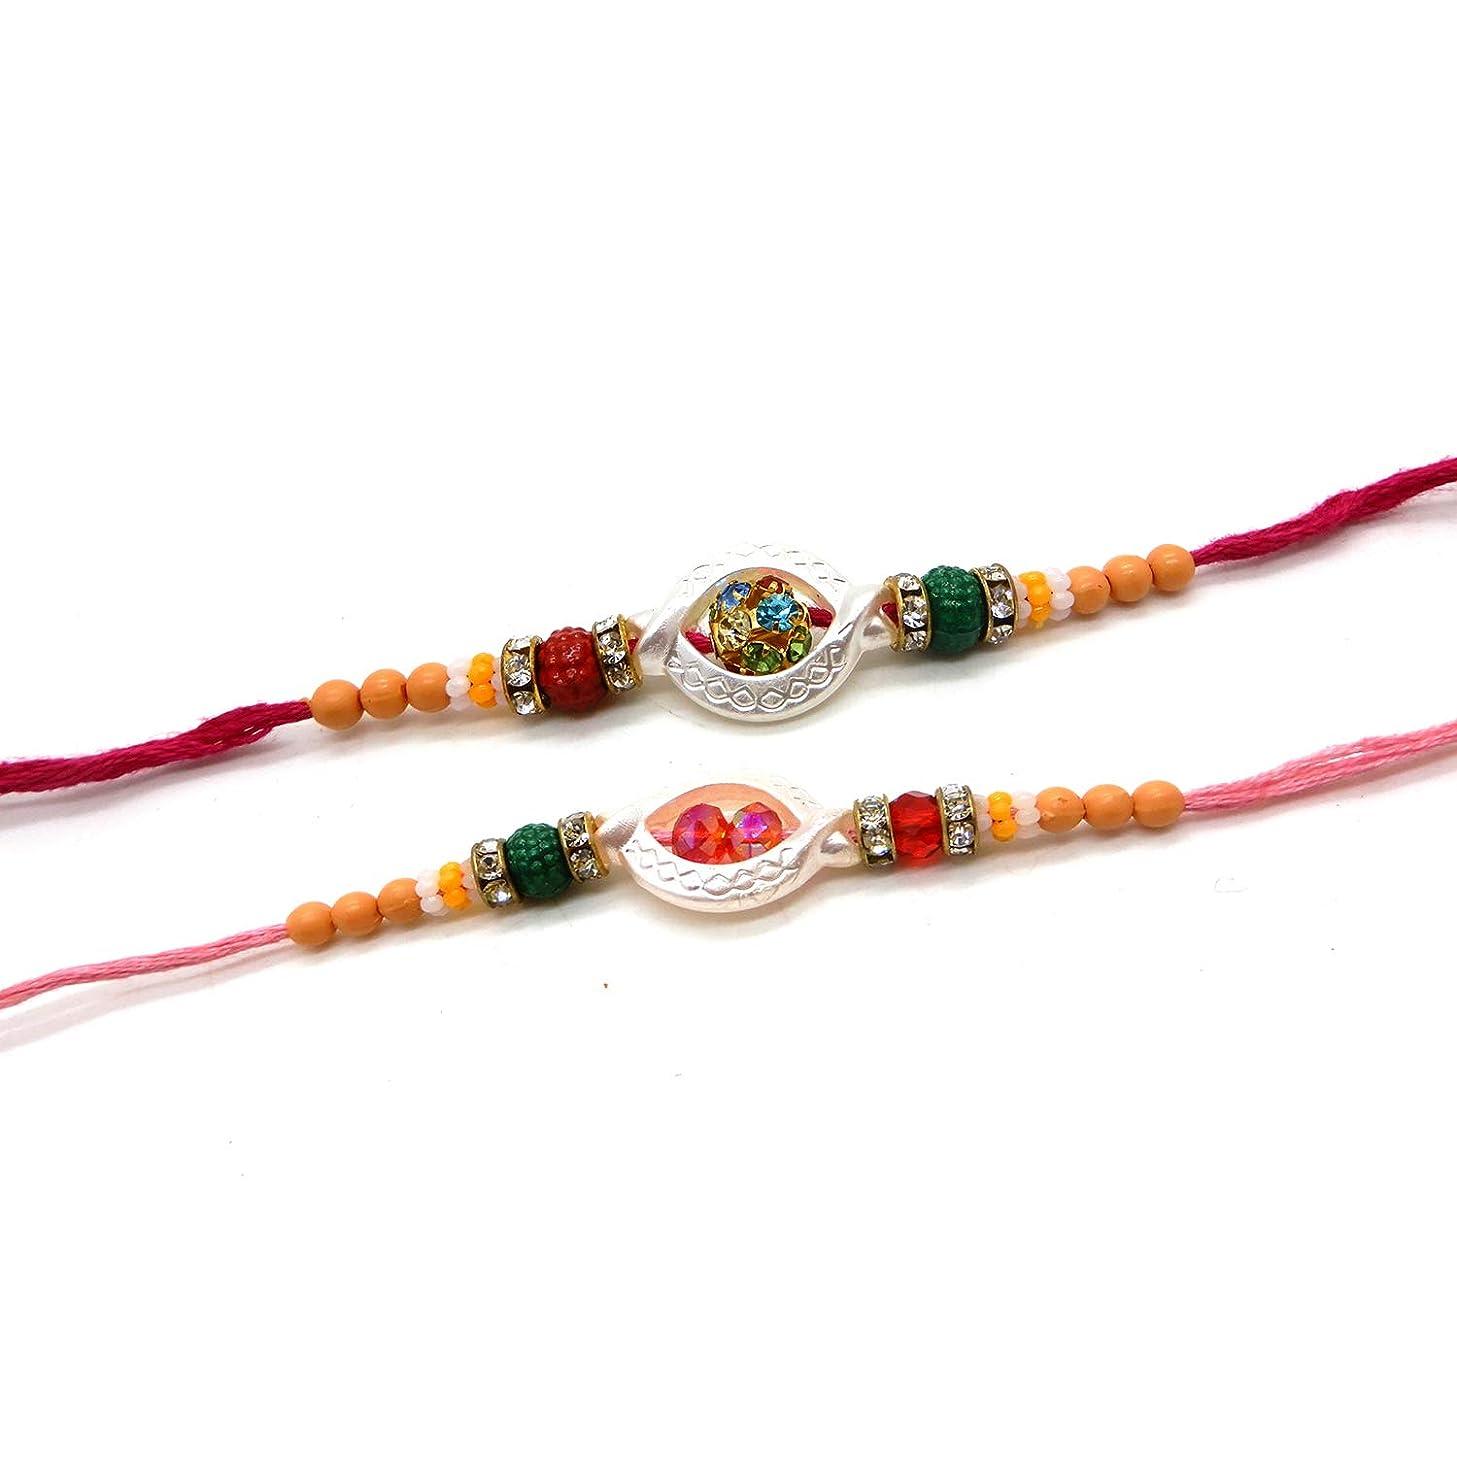 Set of Two Rakhi, Oval Shape White Ring Rudrakhsa Rakhi thread, Raksha bandhan Gift for your Brother, Red Color Thread.